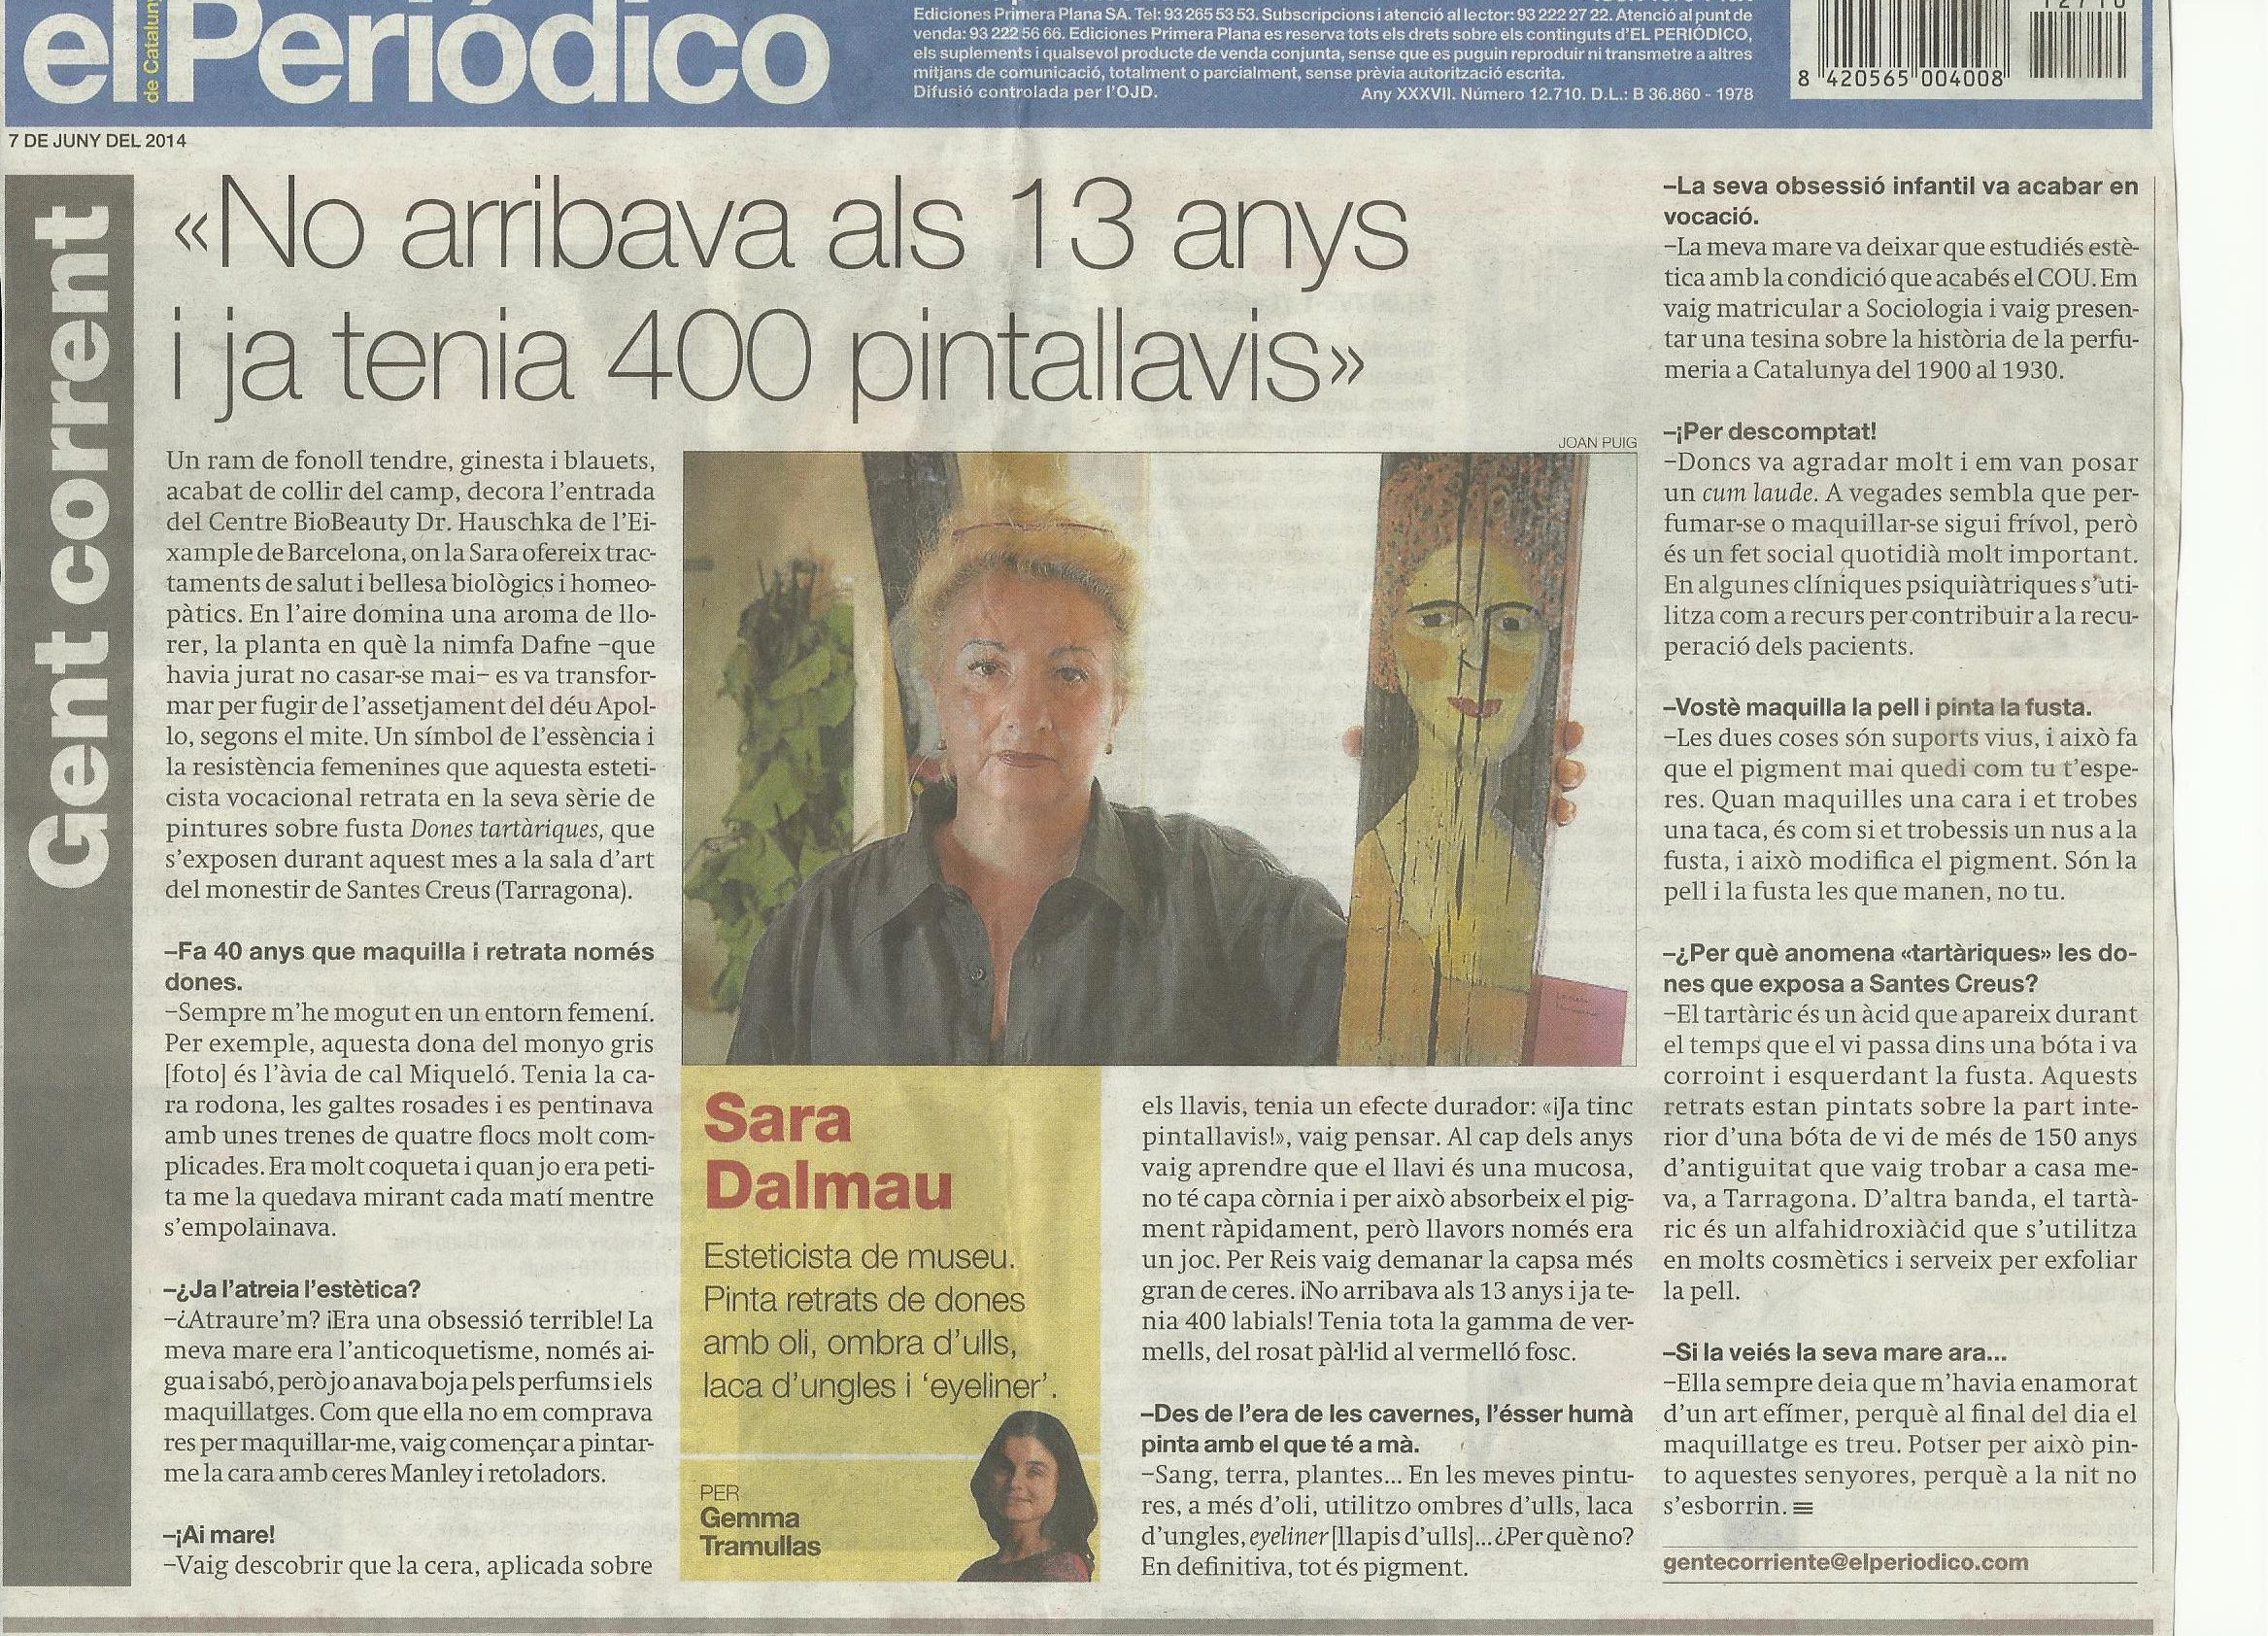 Sara Dalmau -El Periodico, Junio 2014 gabinete de prensa